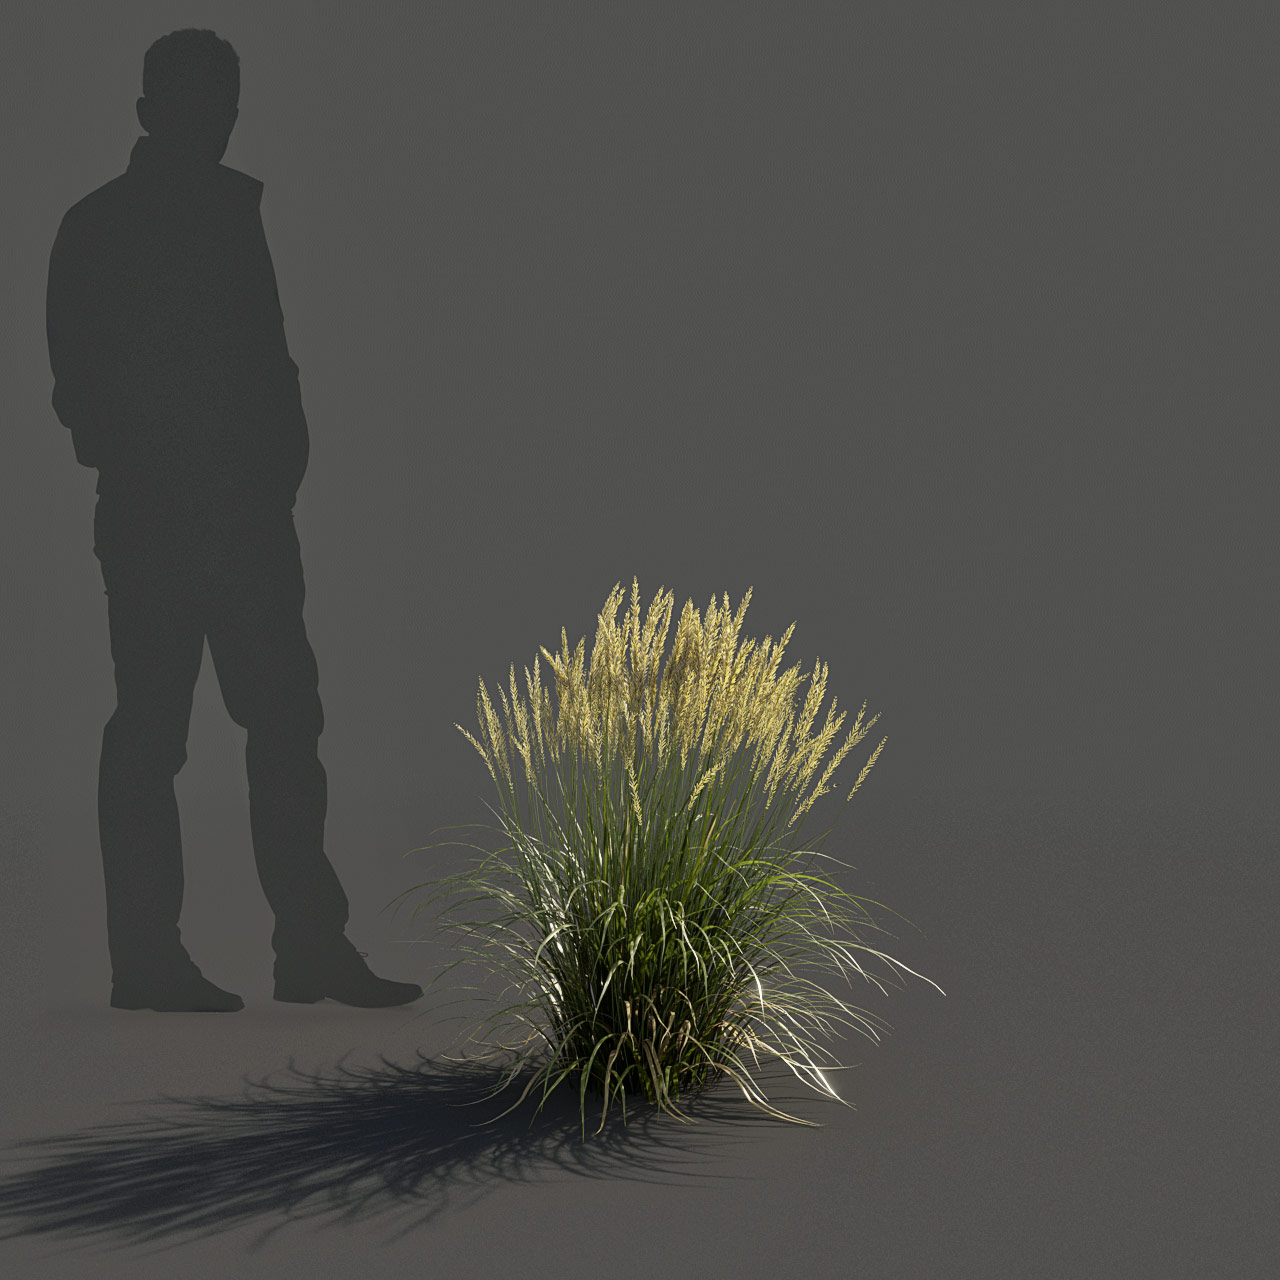 Feather Reed Grass 3D model low_v02 -  'Karl Foerster' - Calamagrostis acutiflora